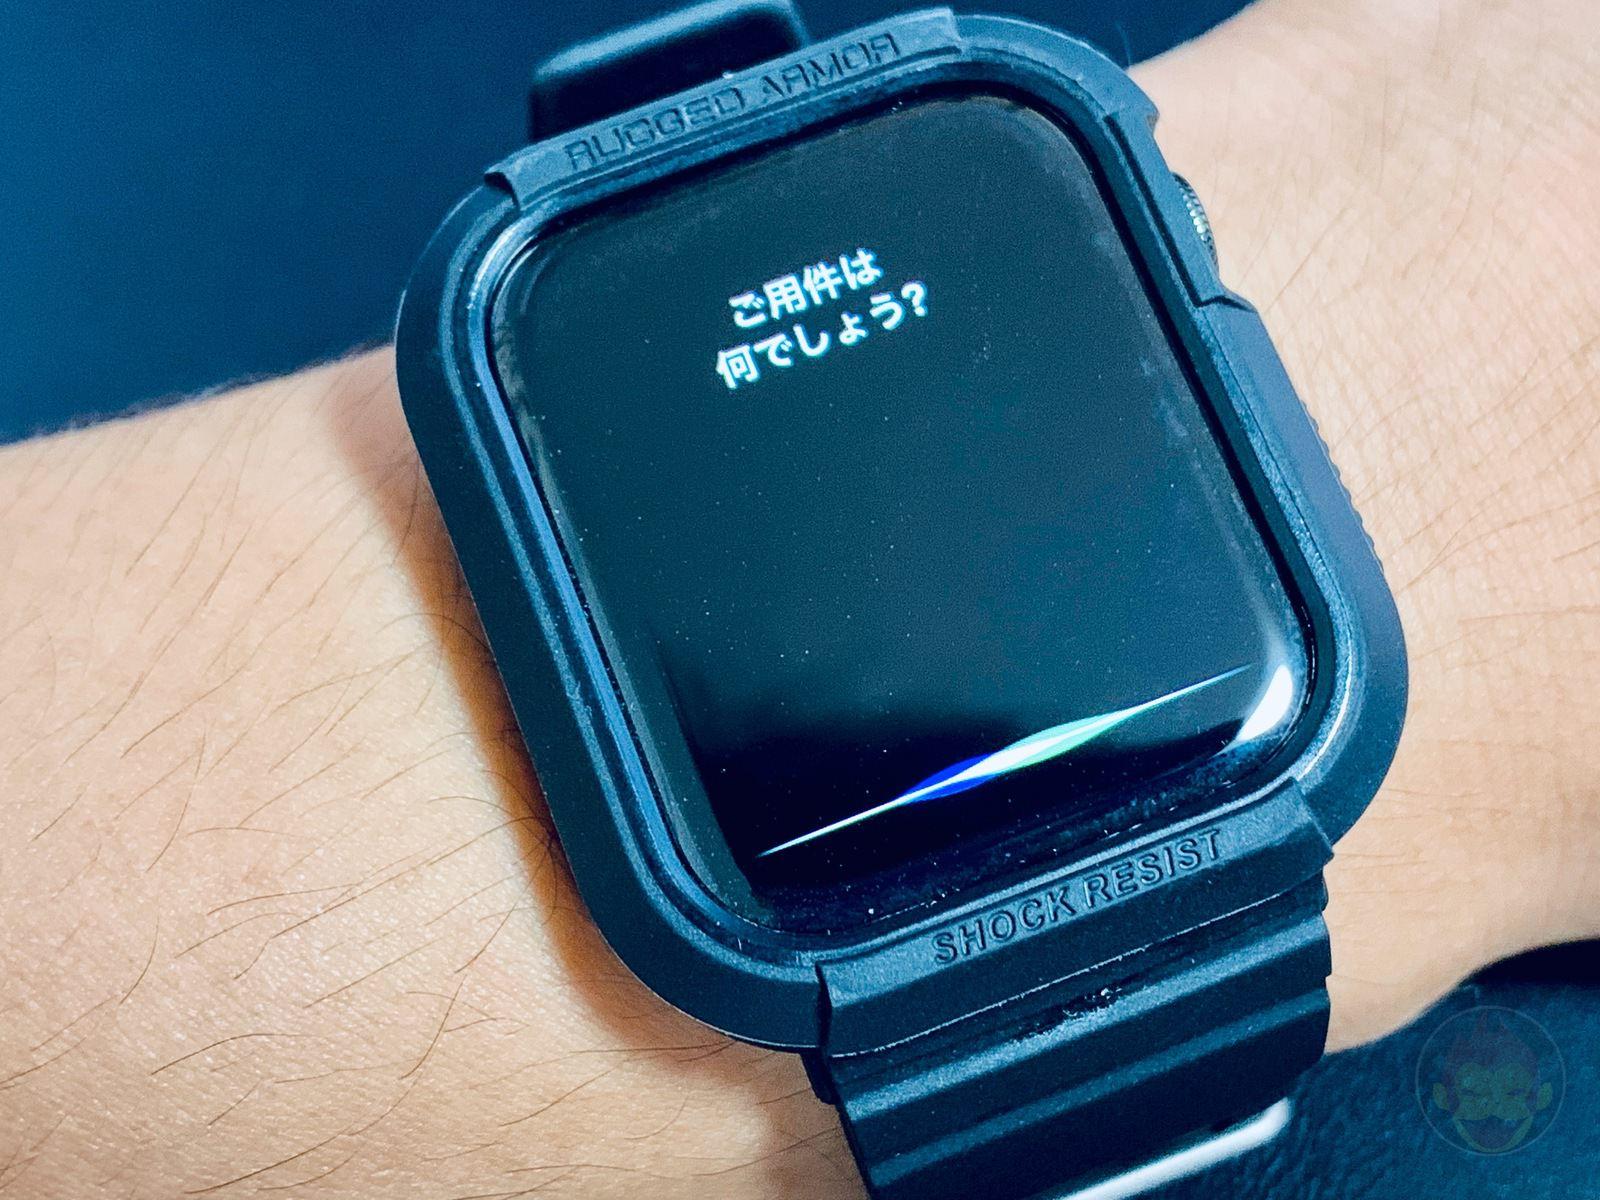 How I use my Apple Watch 03